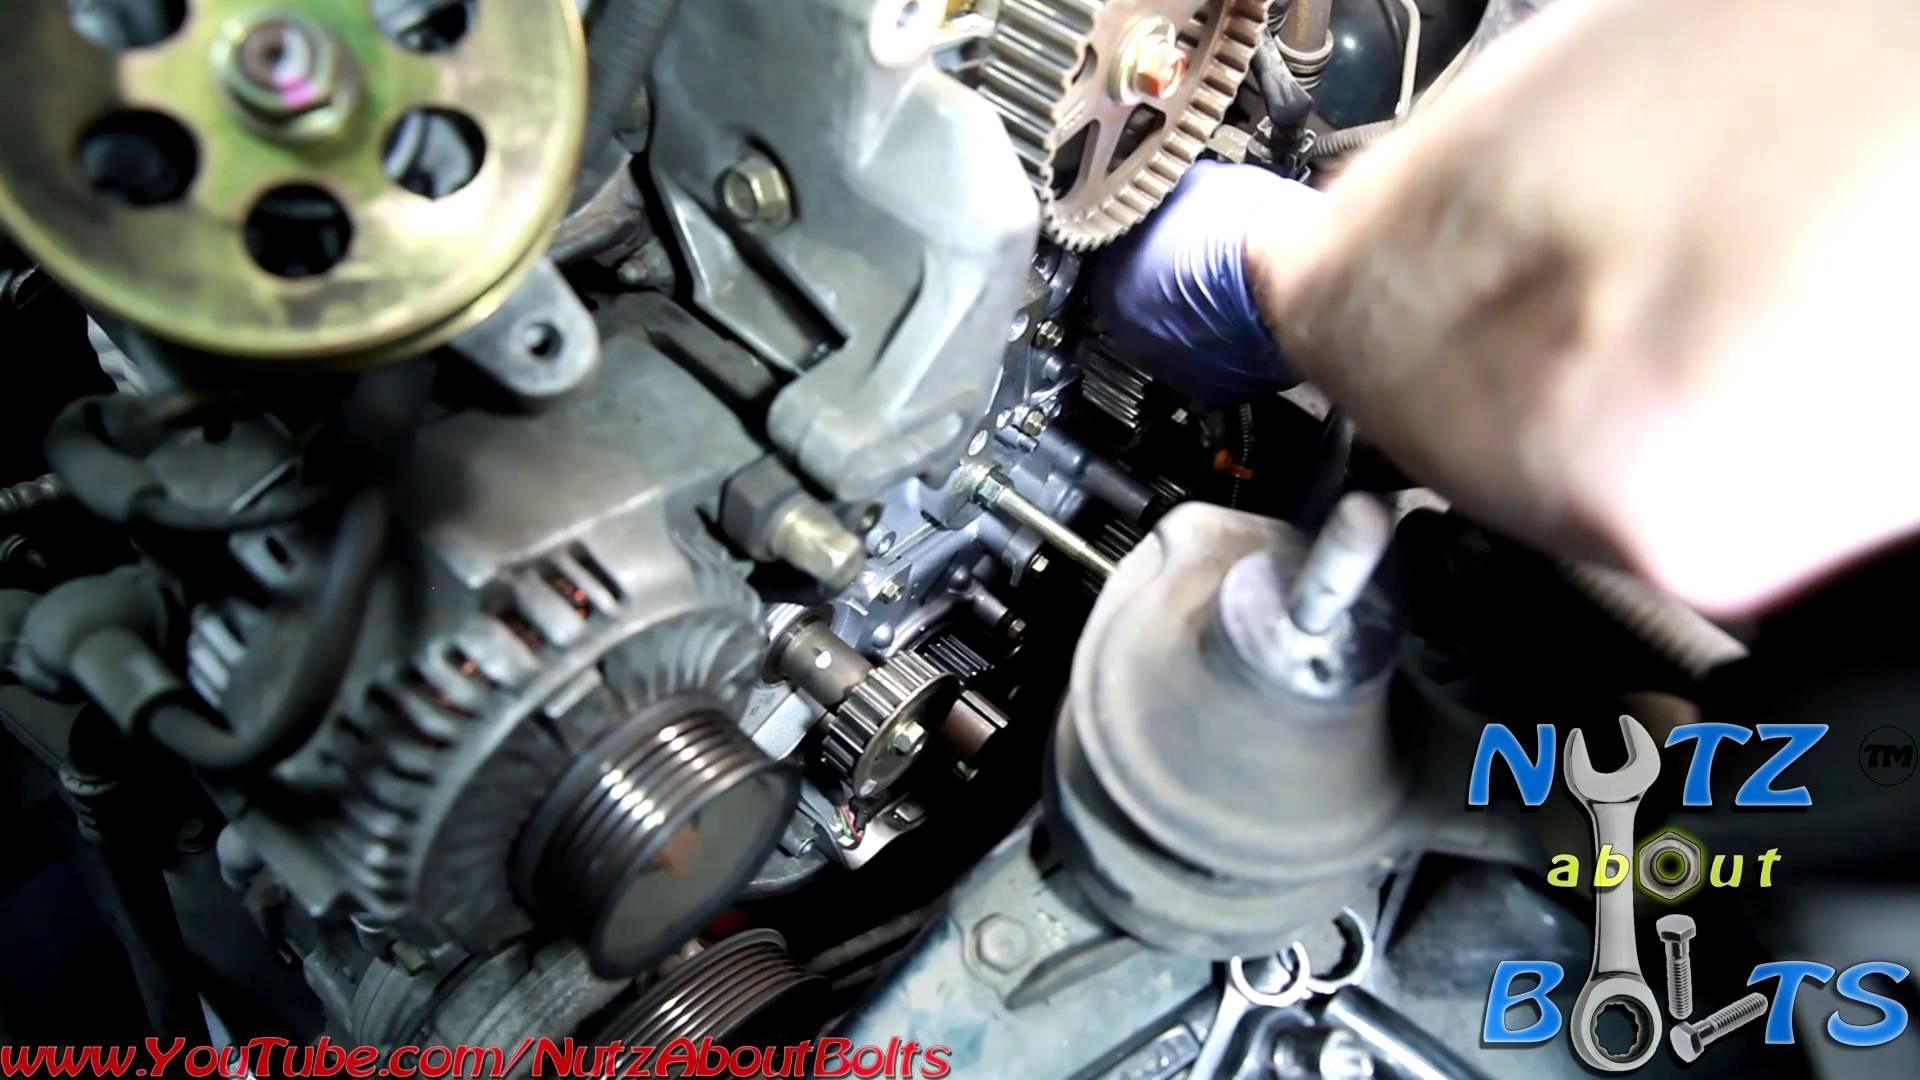 1992 Honda Accord Engine Diagram 1998 2002 Honda Accord Timing Belt Replacement with Water Pump Of 1992 Honda Accord Engine Diagram